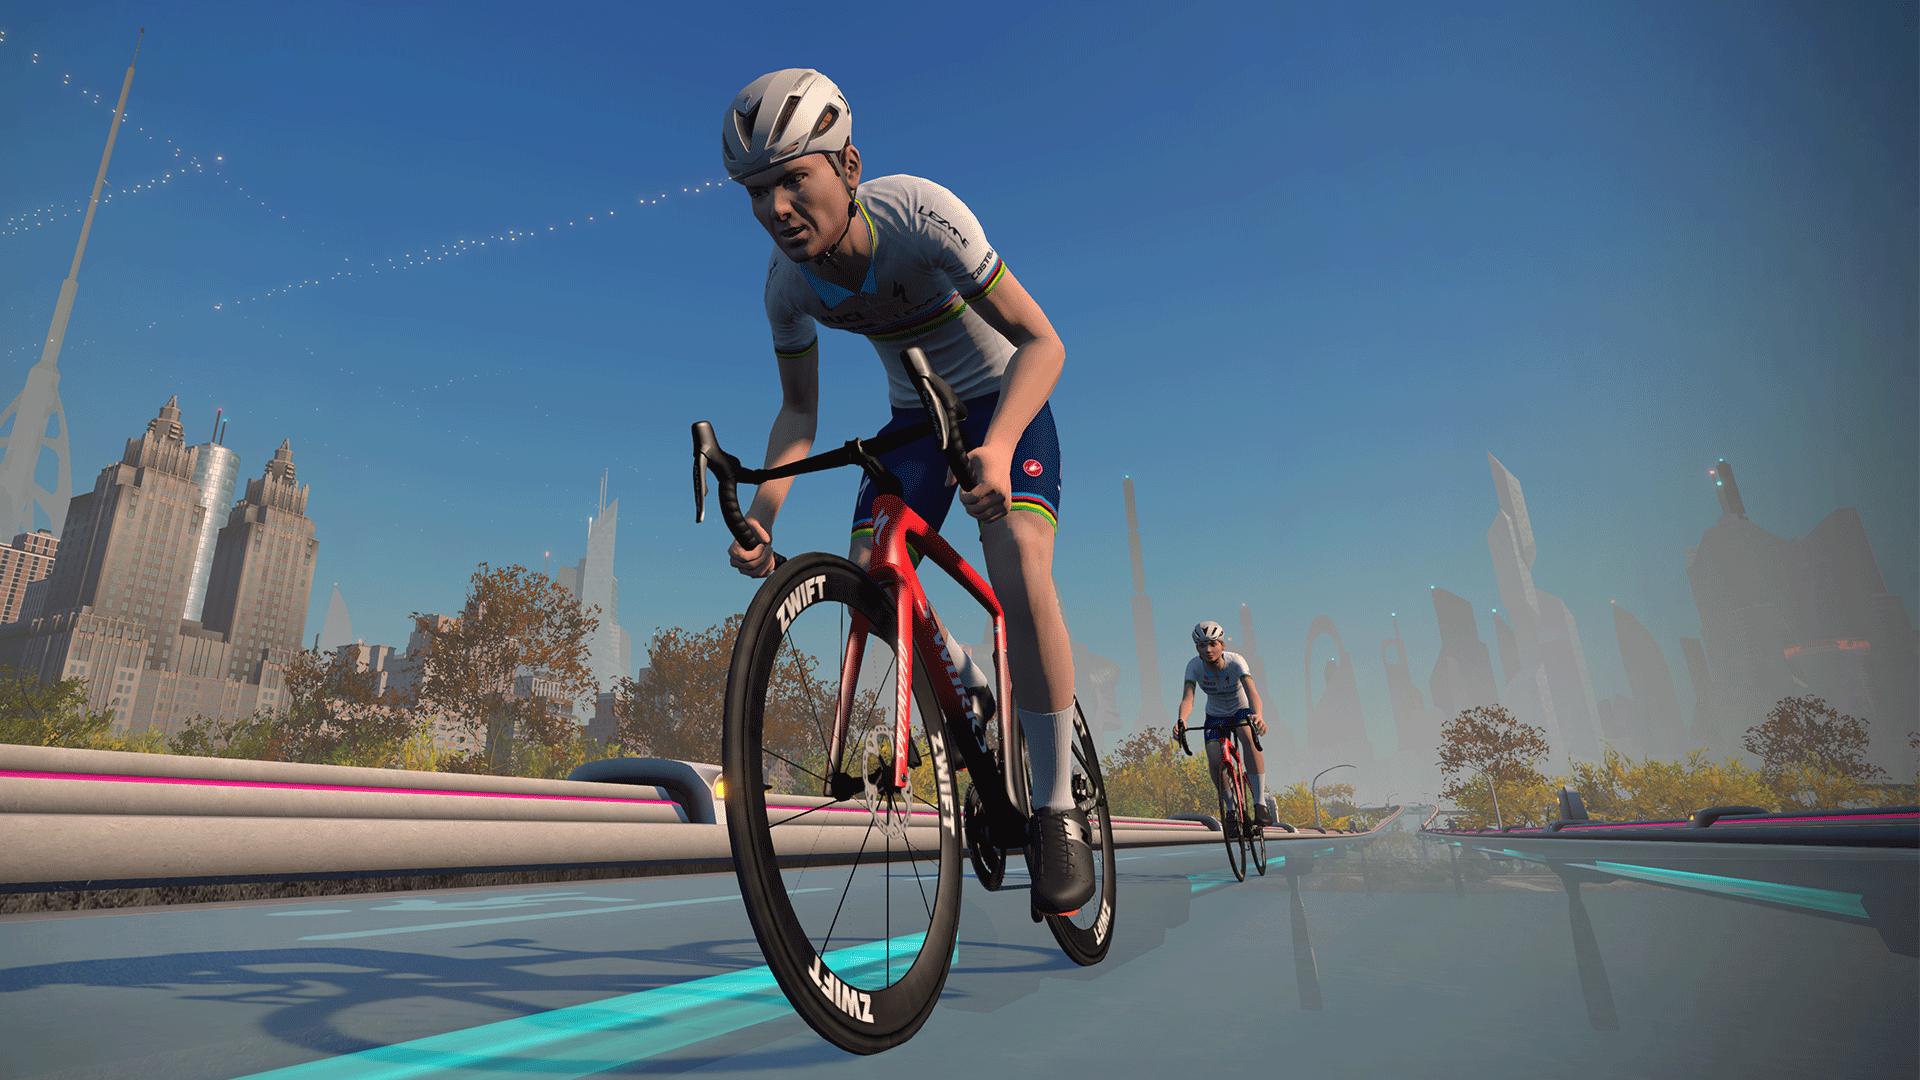 UCI_cycling_esports_announcement_jason_osbourne.png